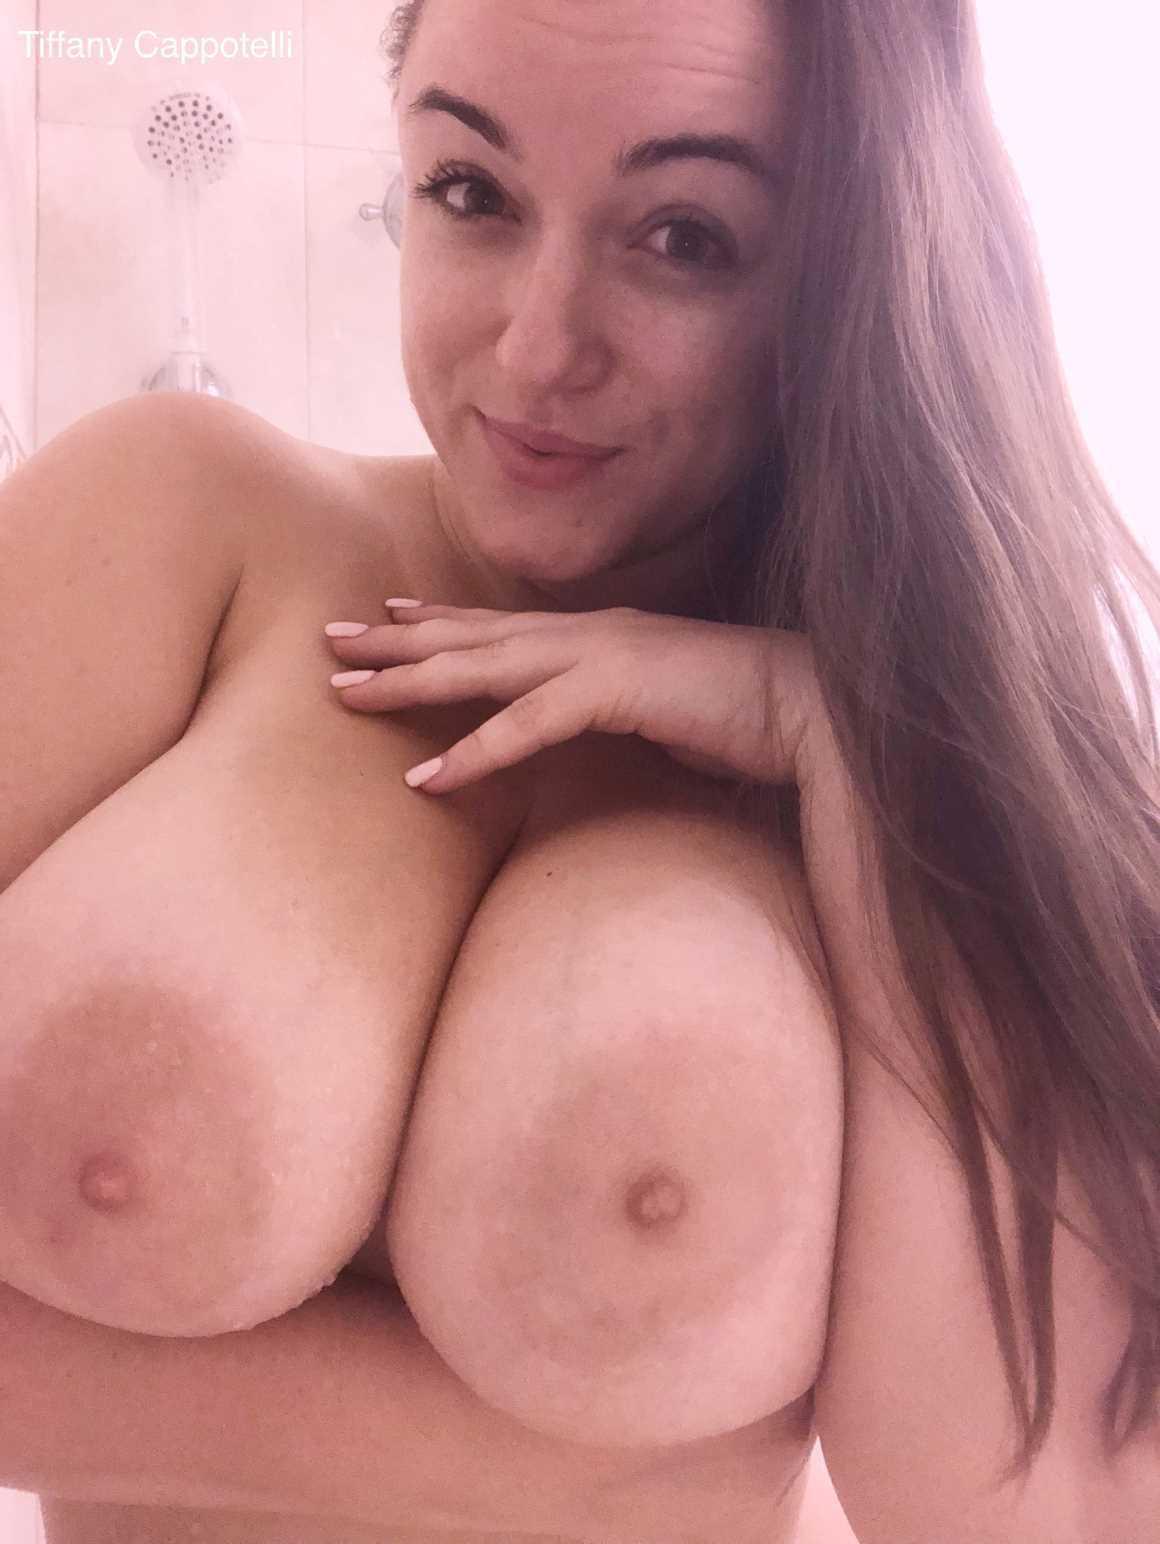 Tiffany Capotelli 0033